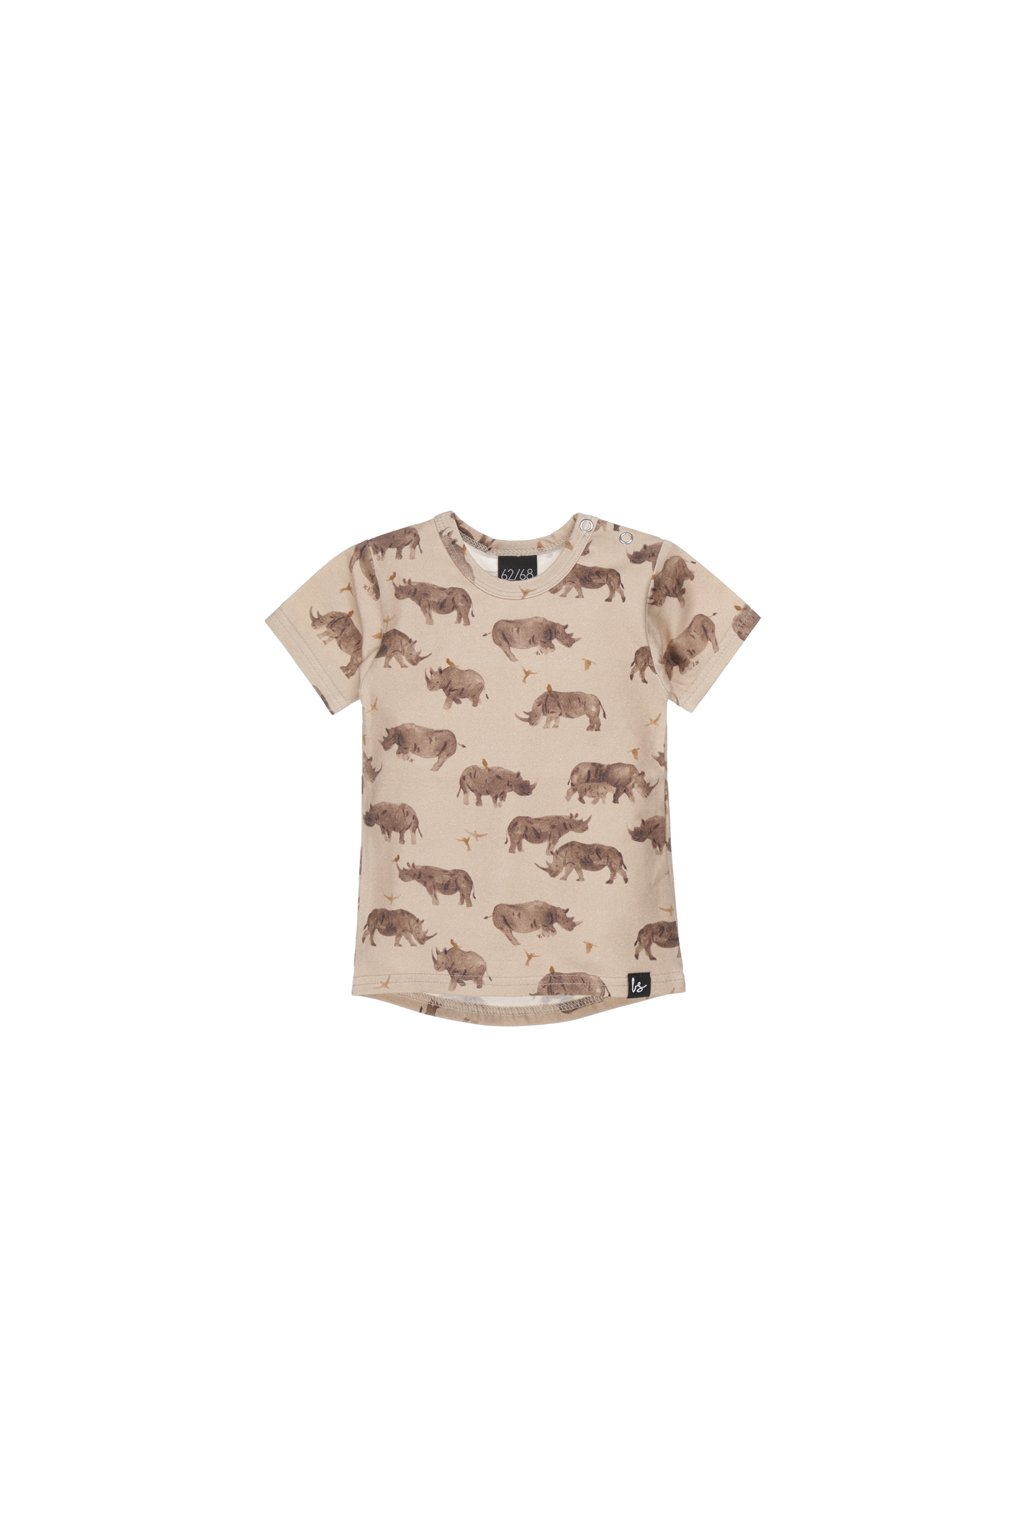 rhino party t shirt babystyling